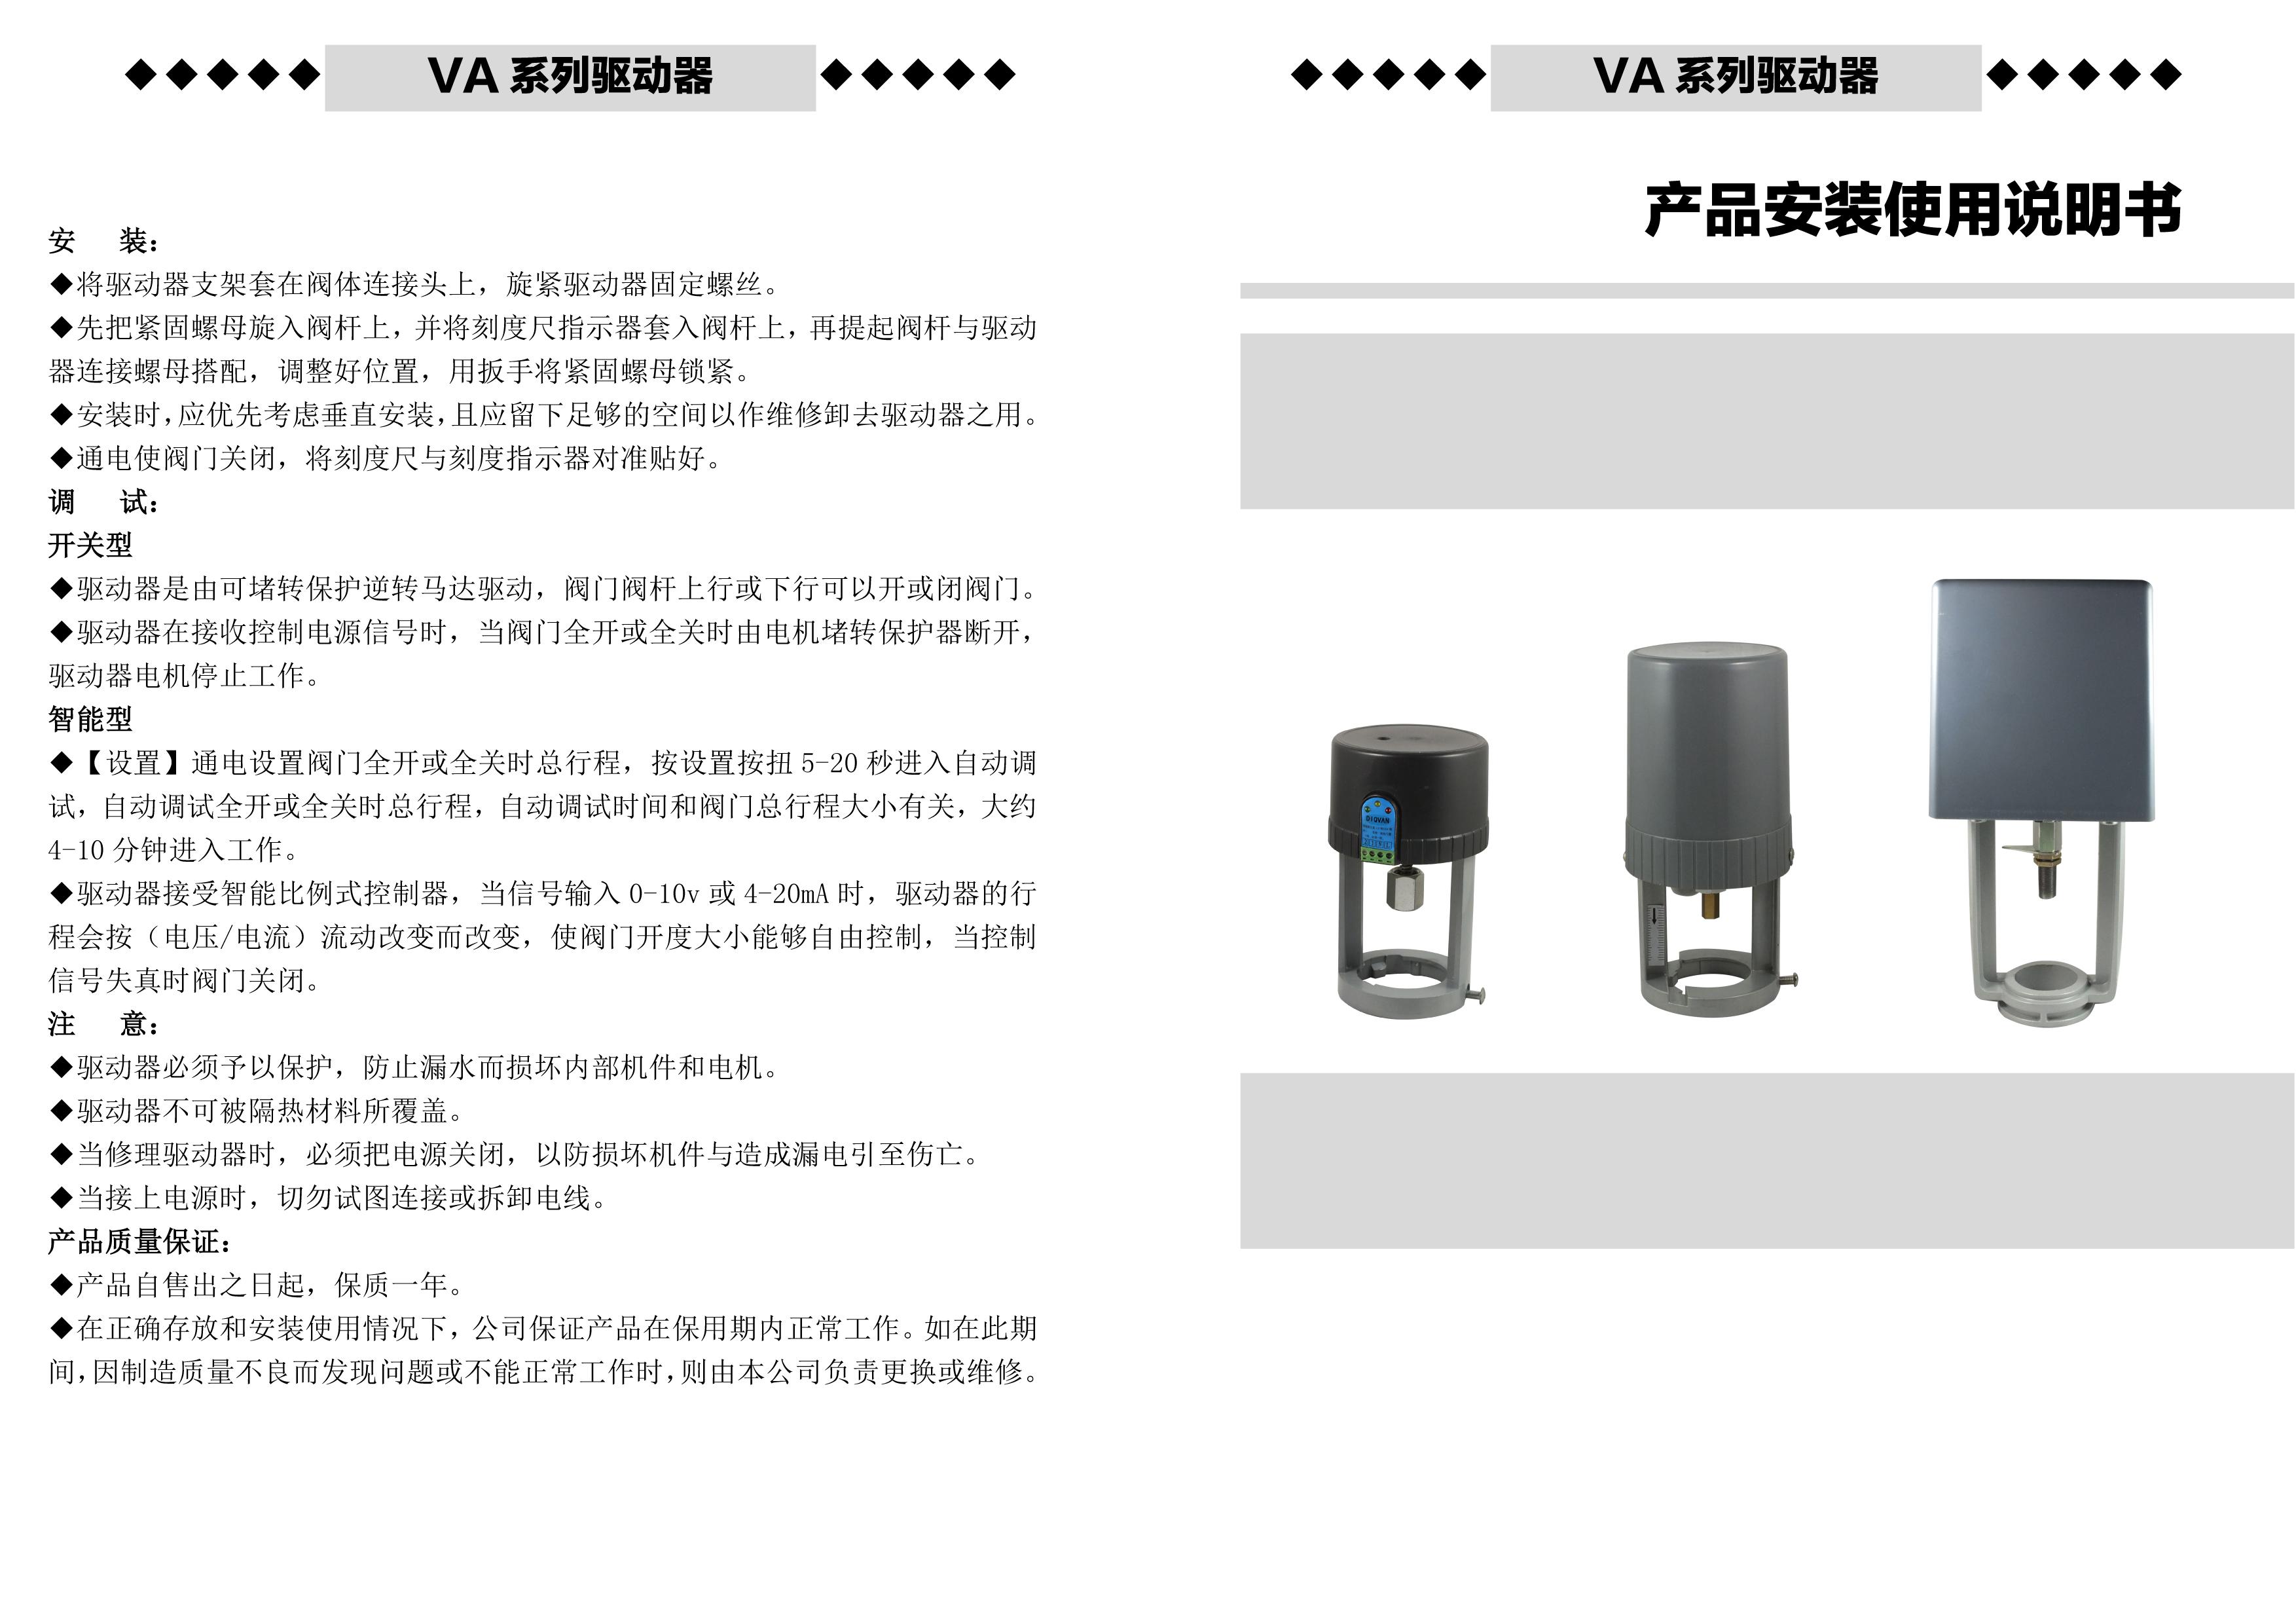 va系列比例积分调节阀接线图图片